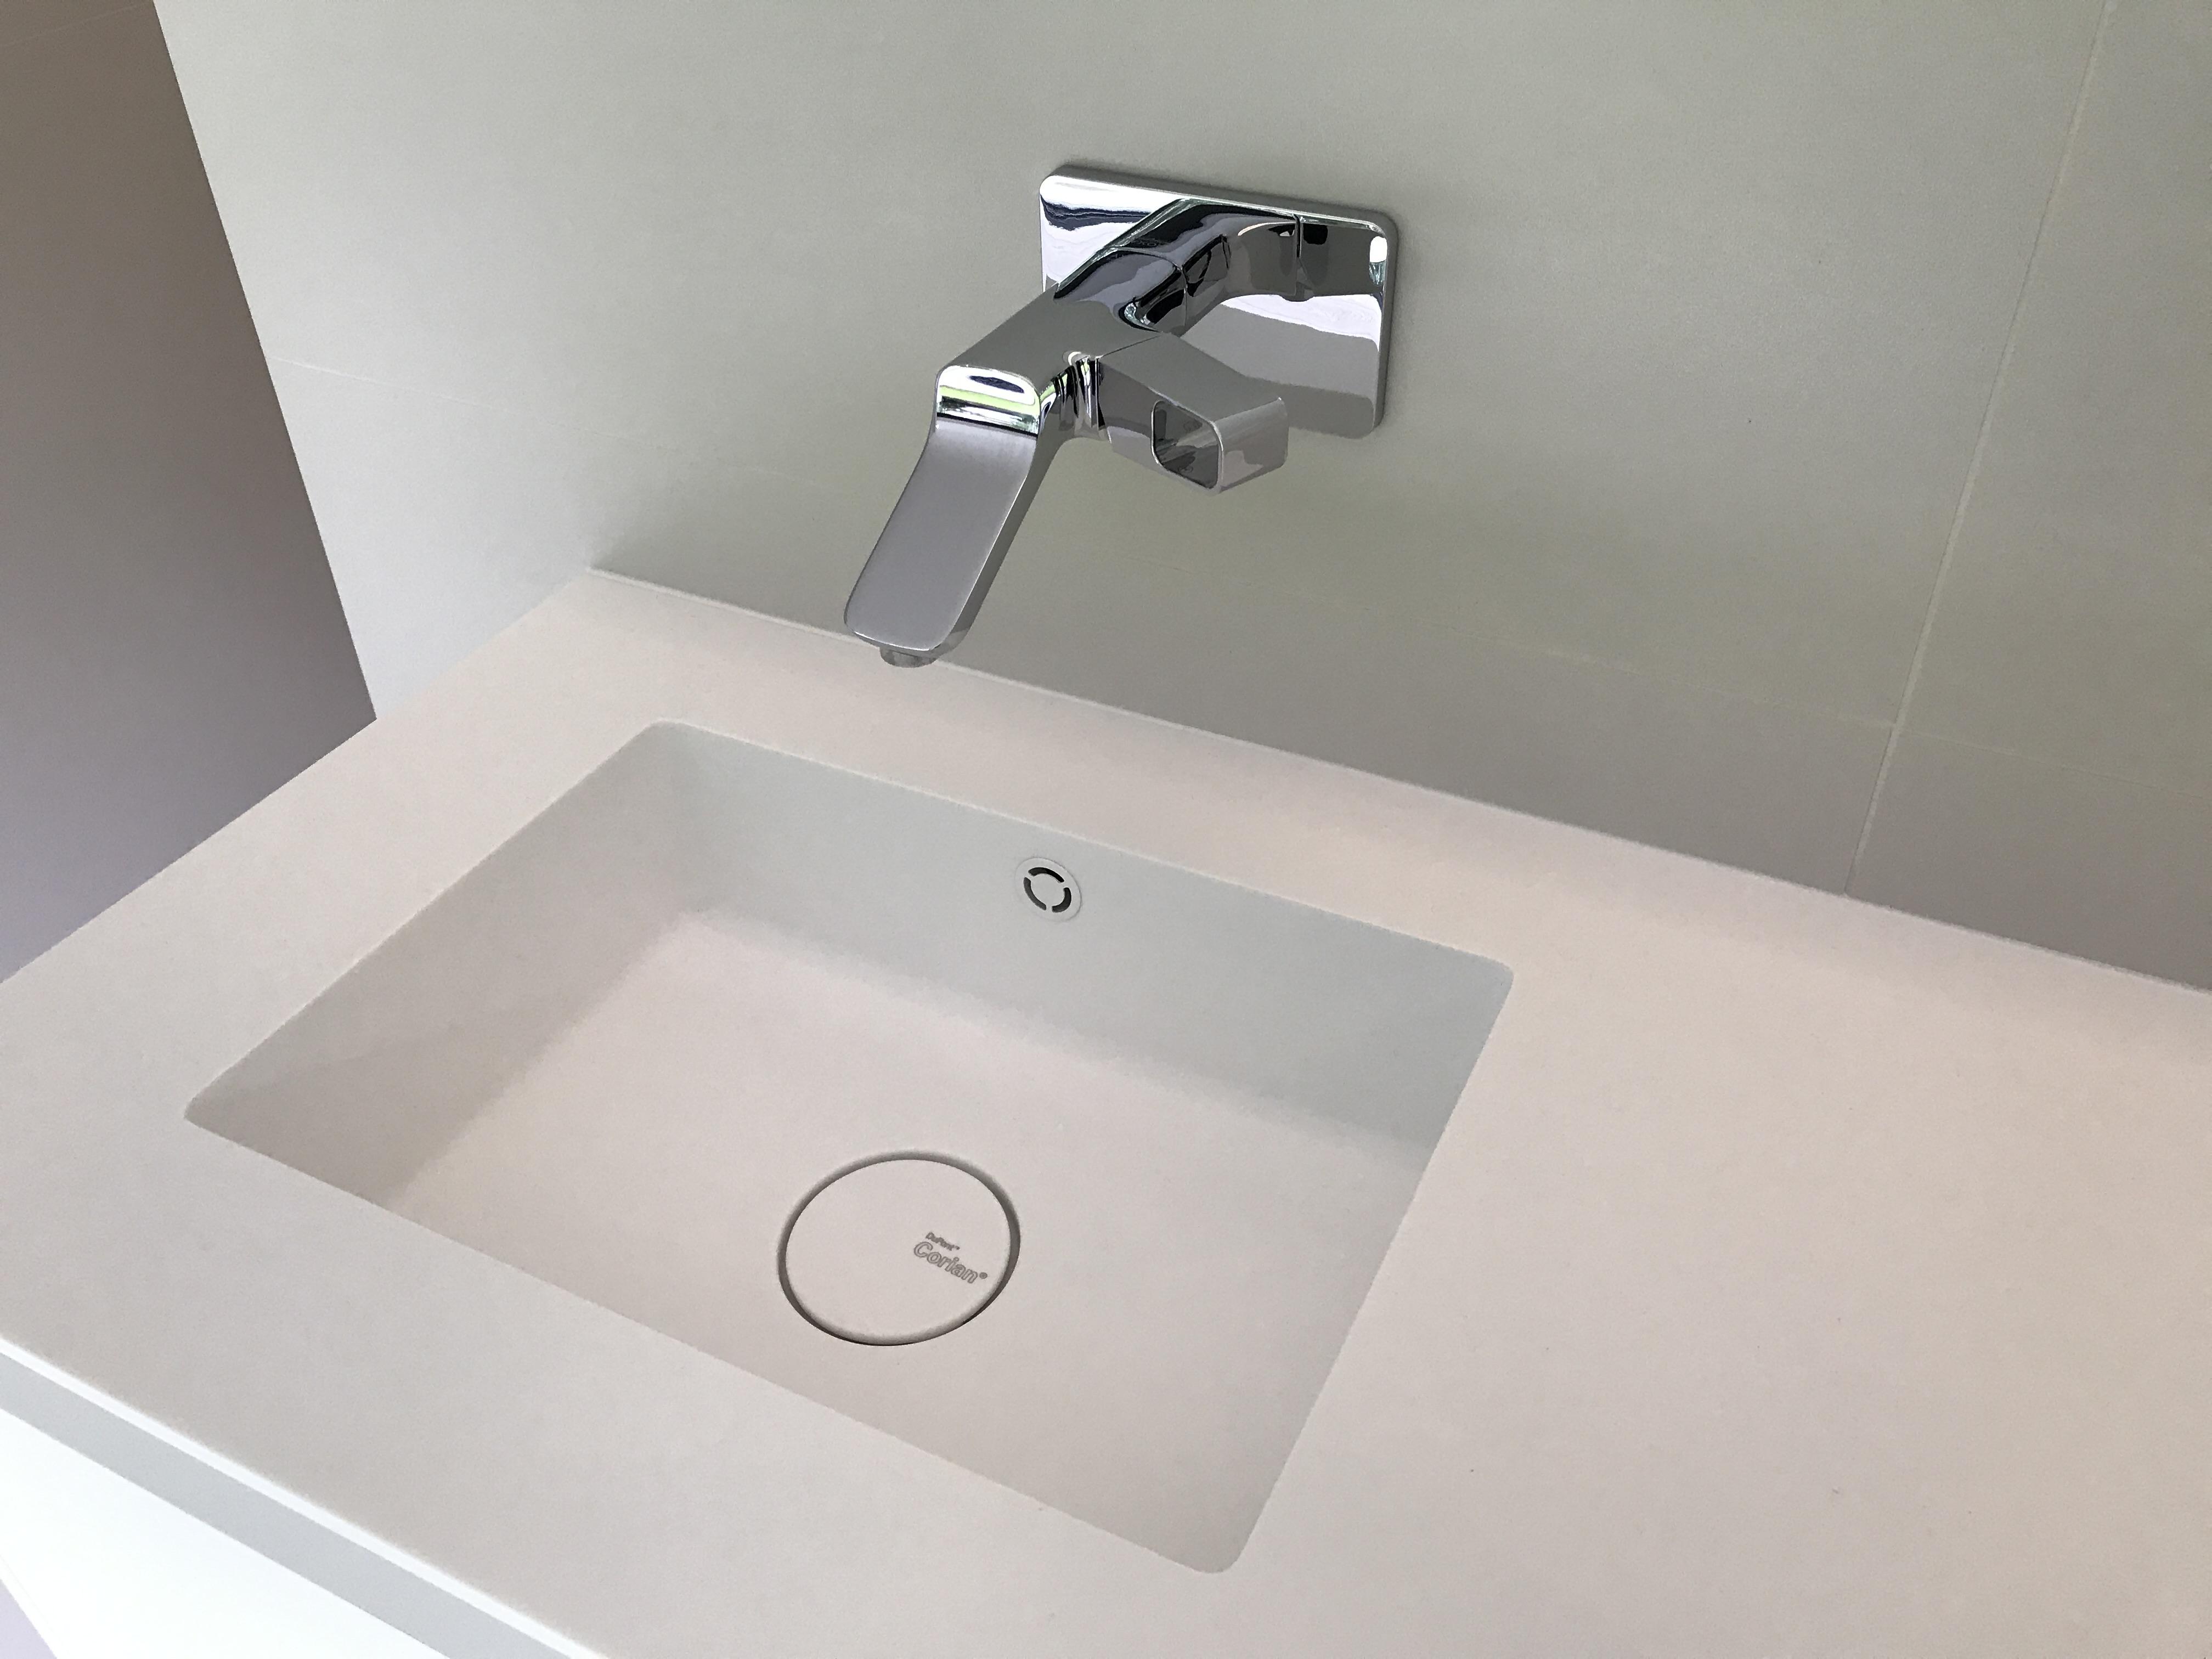 Corian Badkamer Onderhoud : Nieuwe badkamer te roeselare jd technics